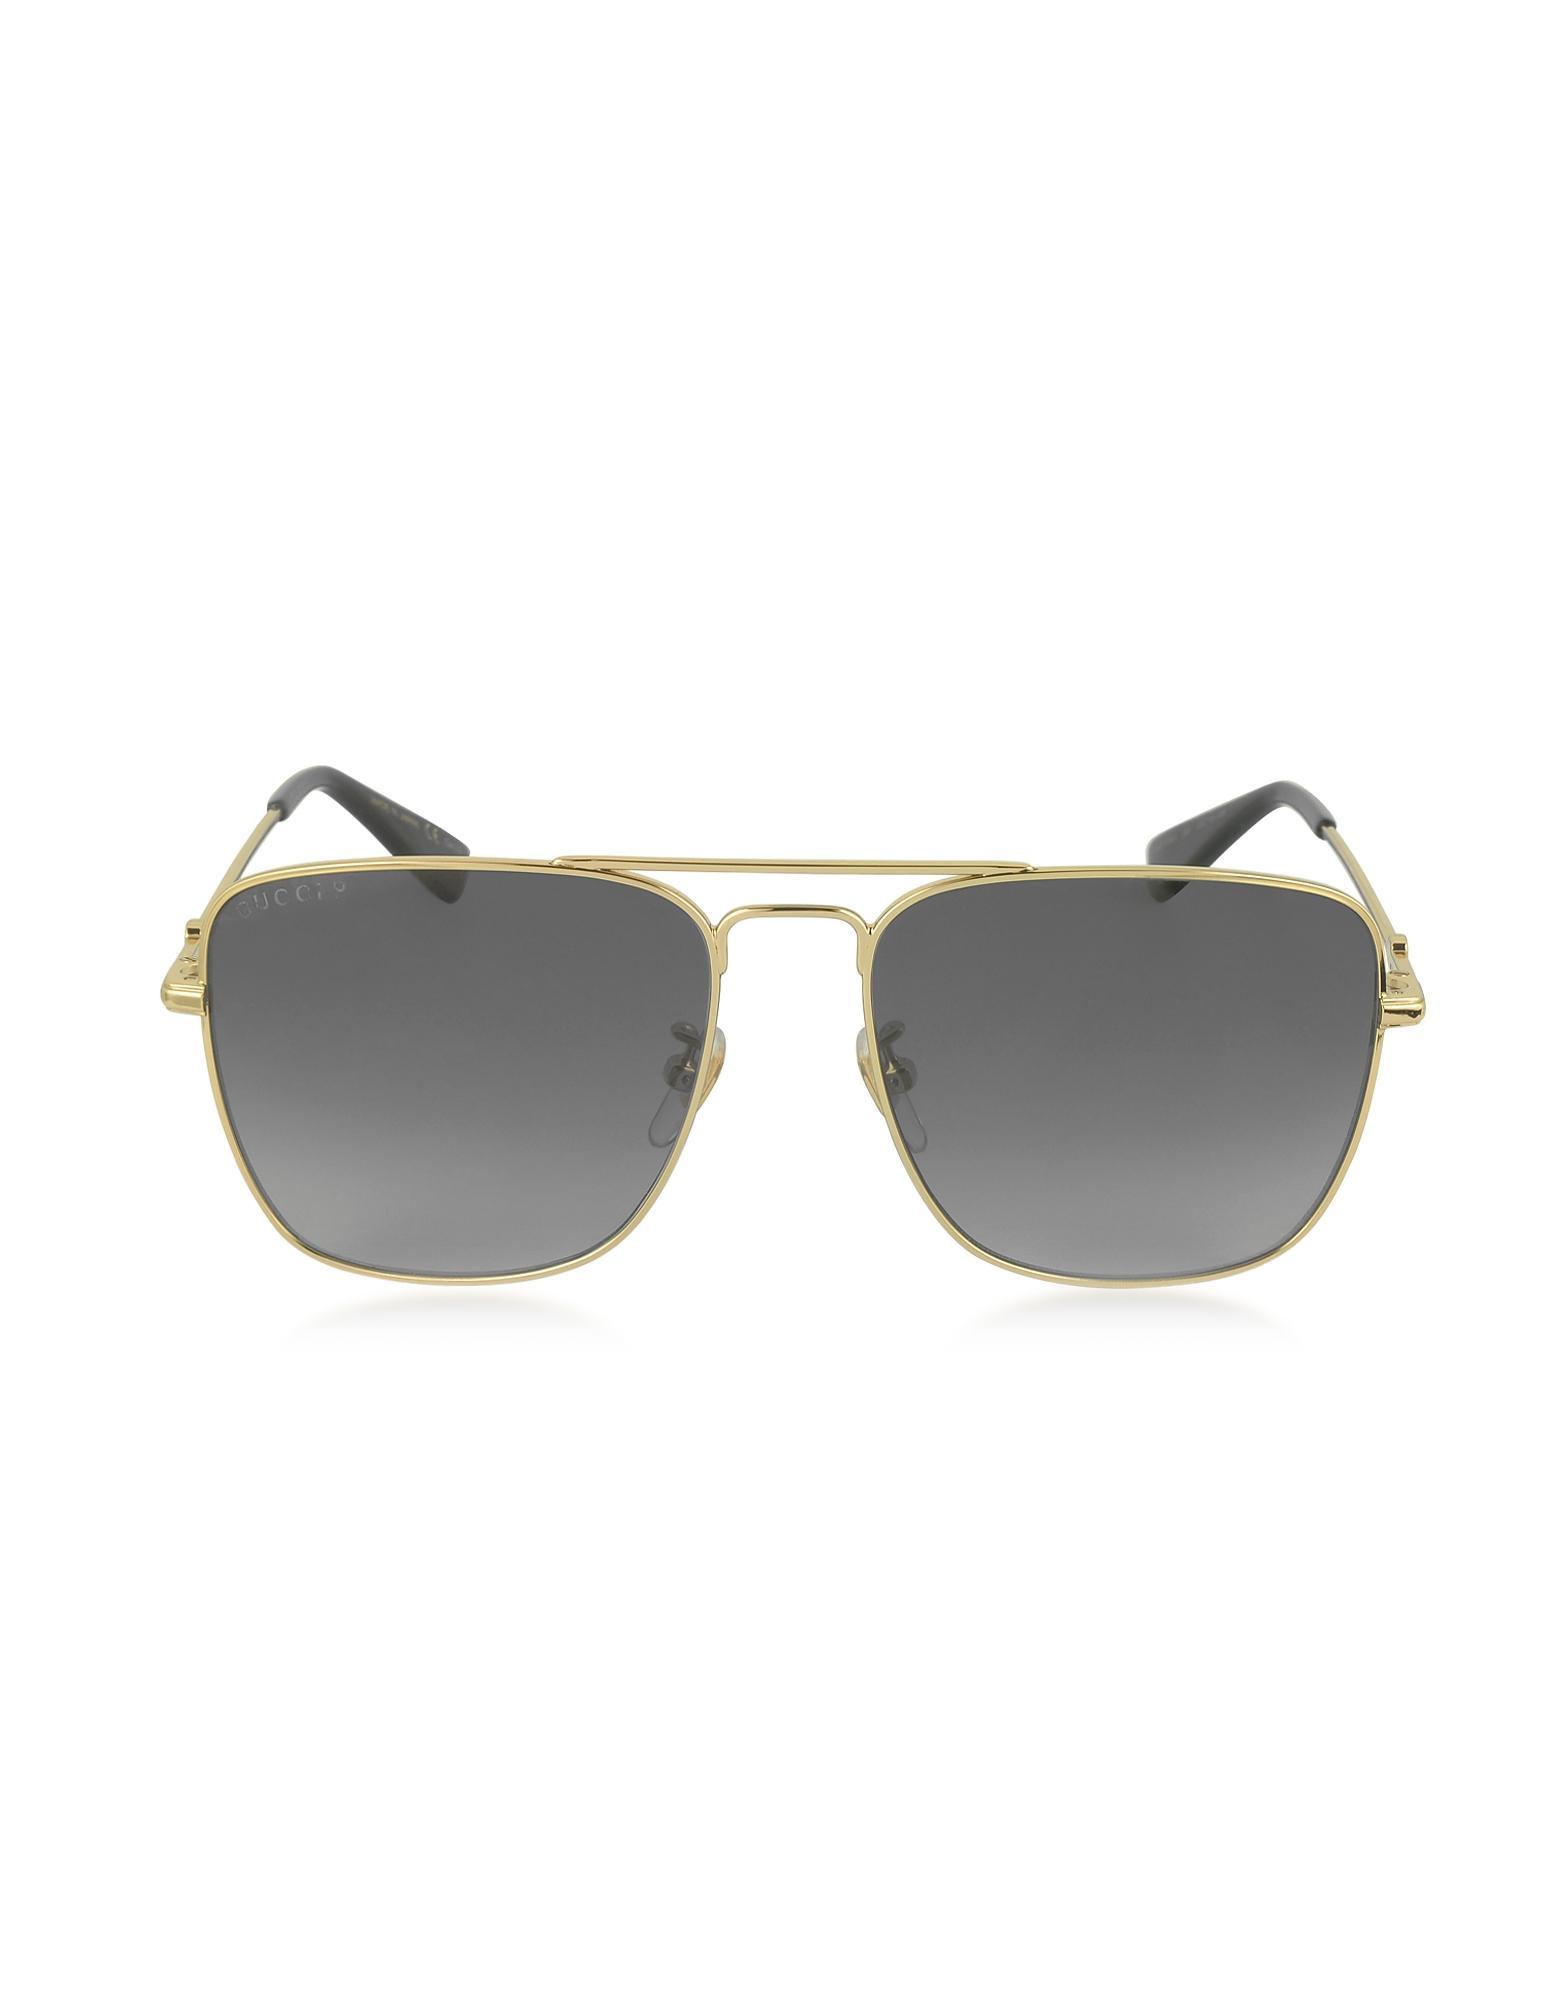 07d76980efe Gucci. Metallic GG0108S 006 Gold Metal Square Aviator Men s Polarized  Sunglasses